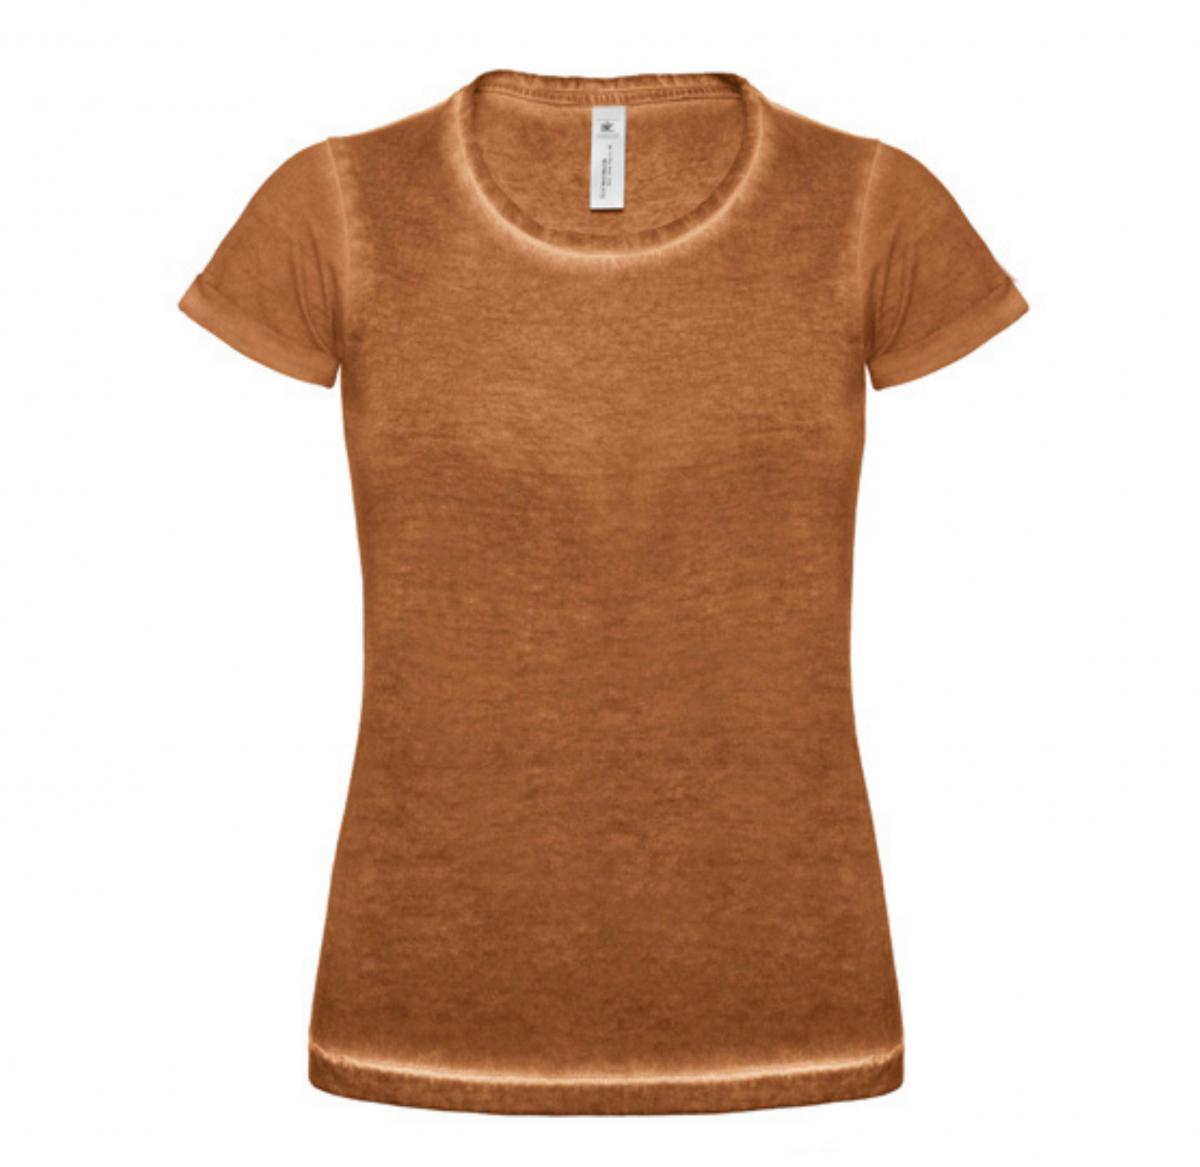 Tee-Shirt Femme Vintage - Cuir fauve